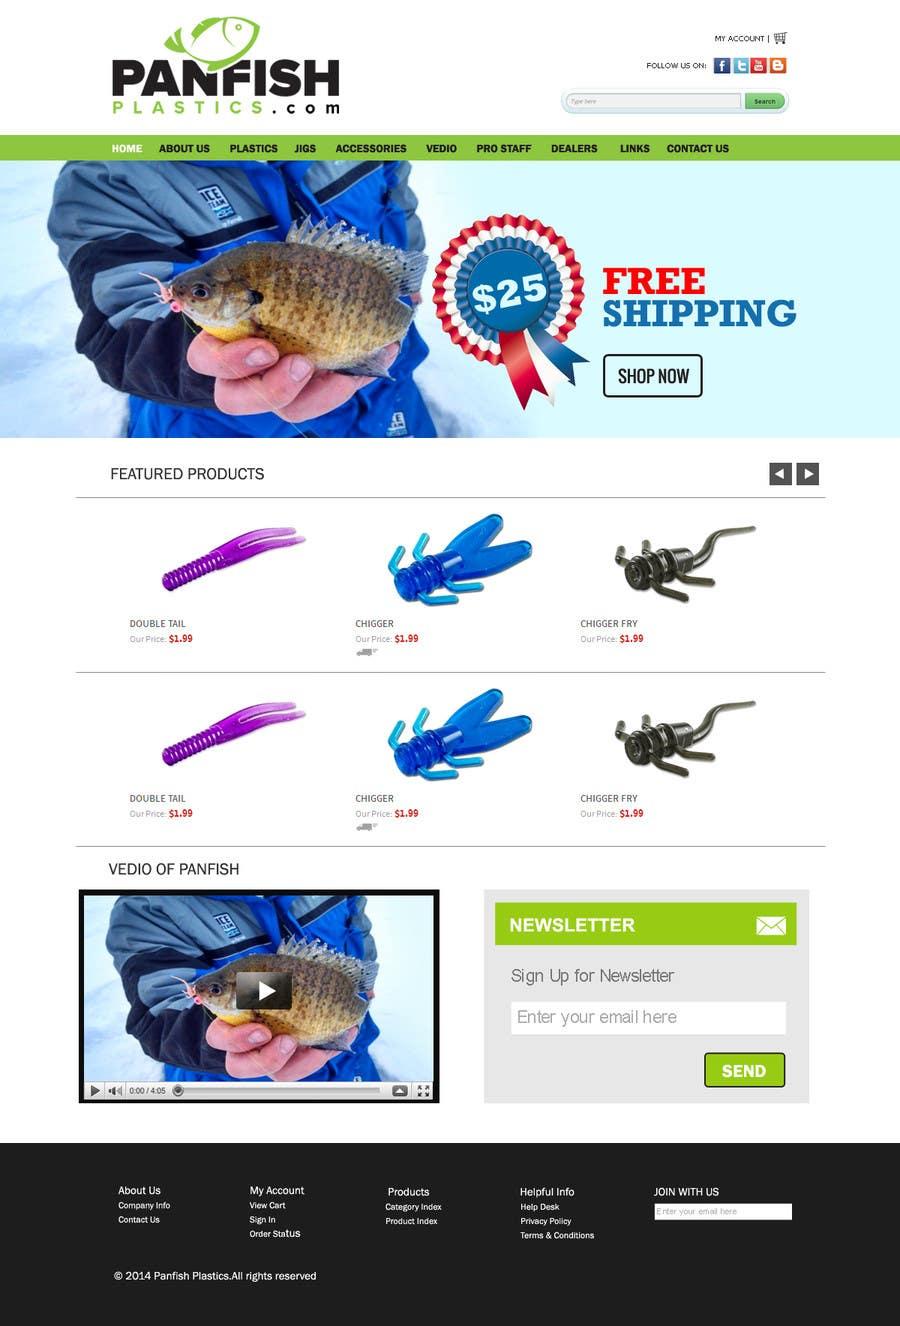 Penyertaan Peraduan #                                        17                                      untuk                                         Design a Website Mockup for ecommerce fishing store